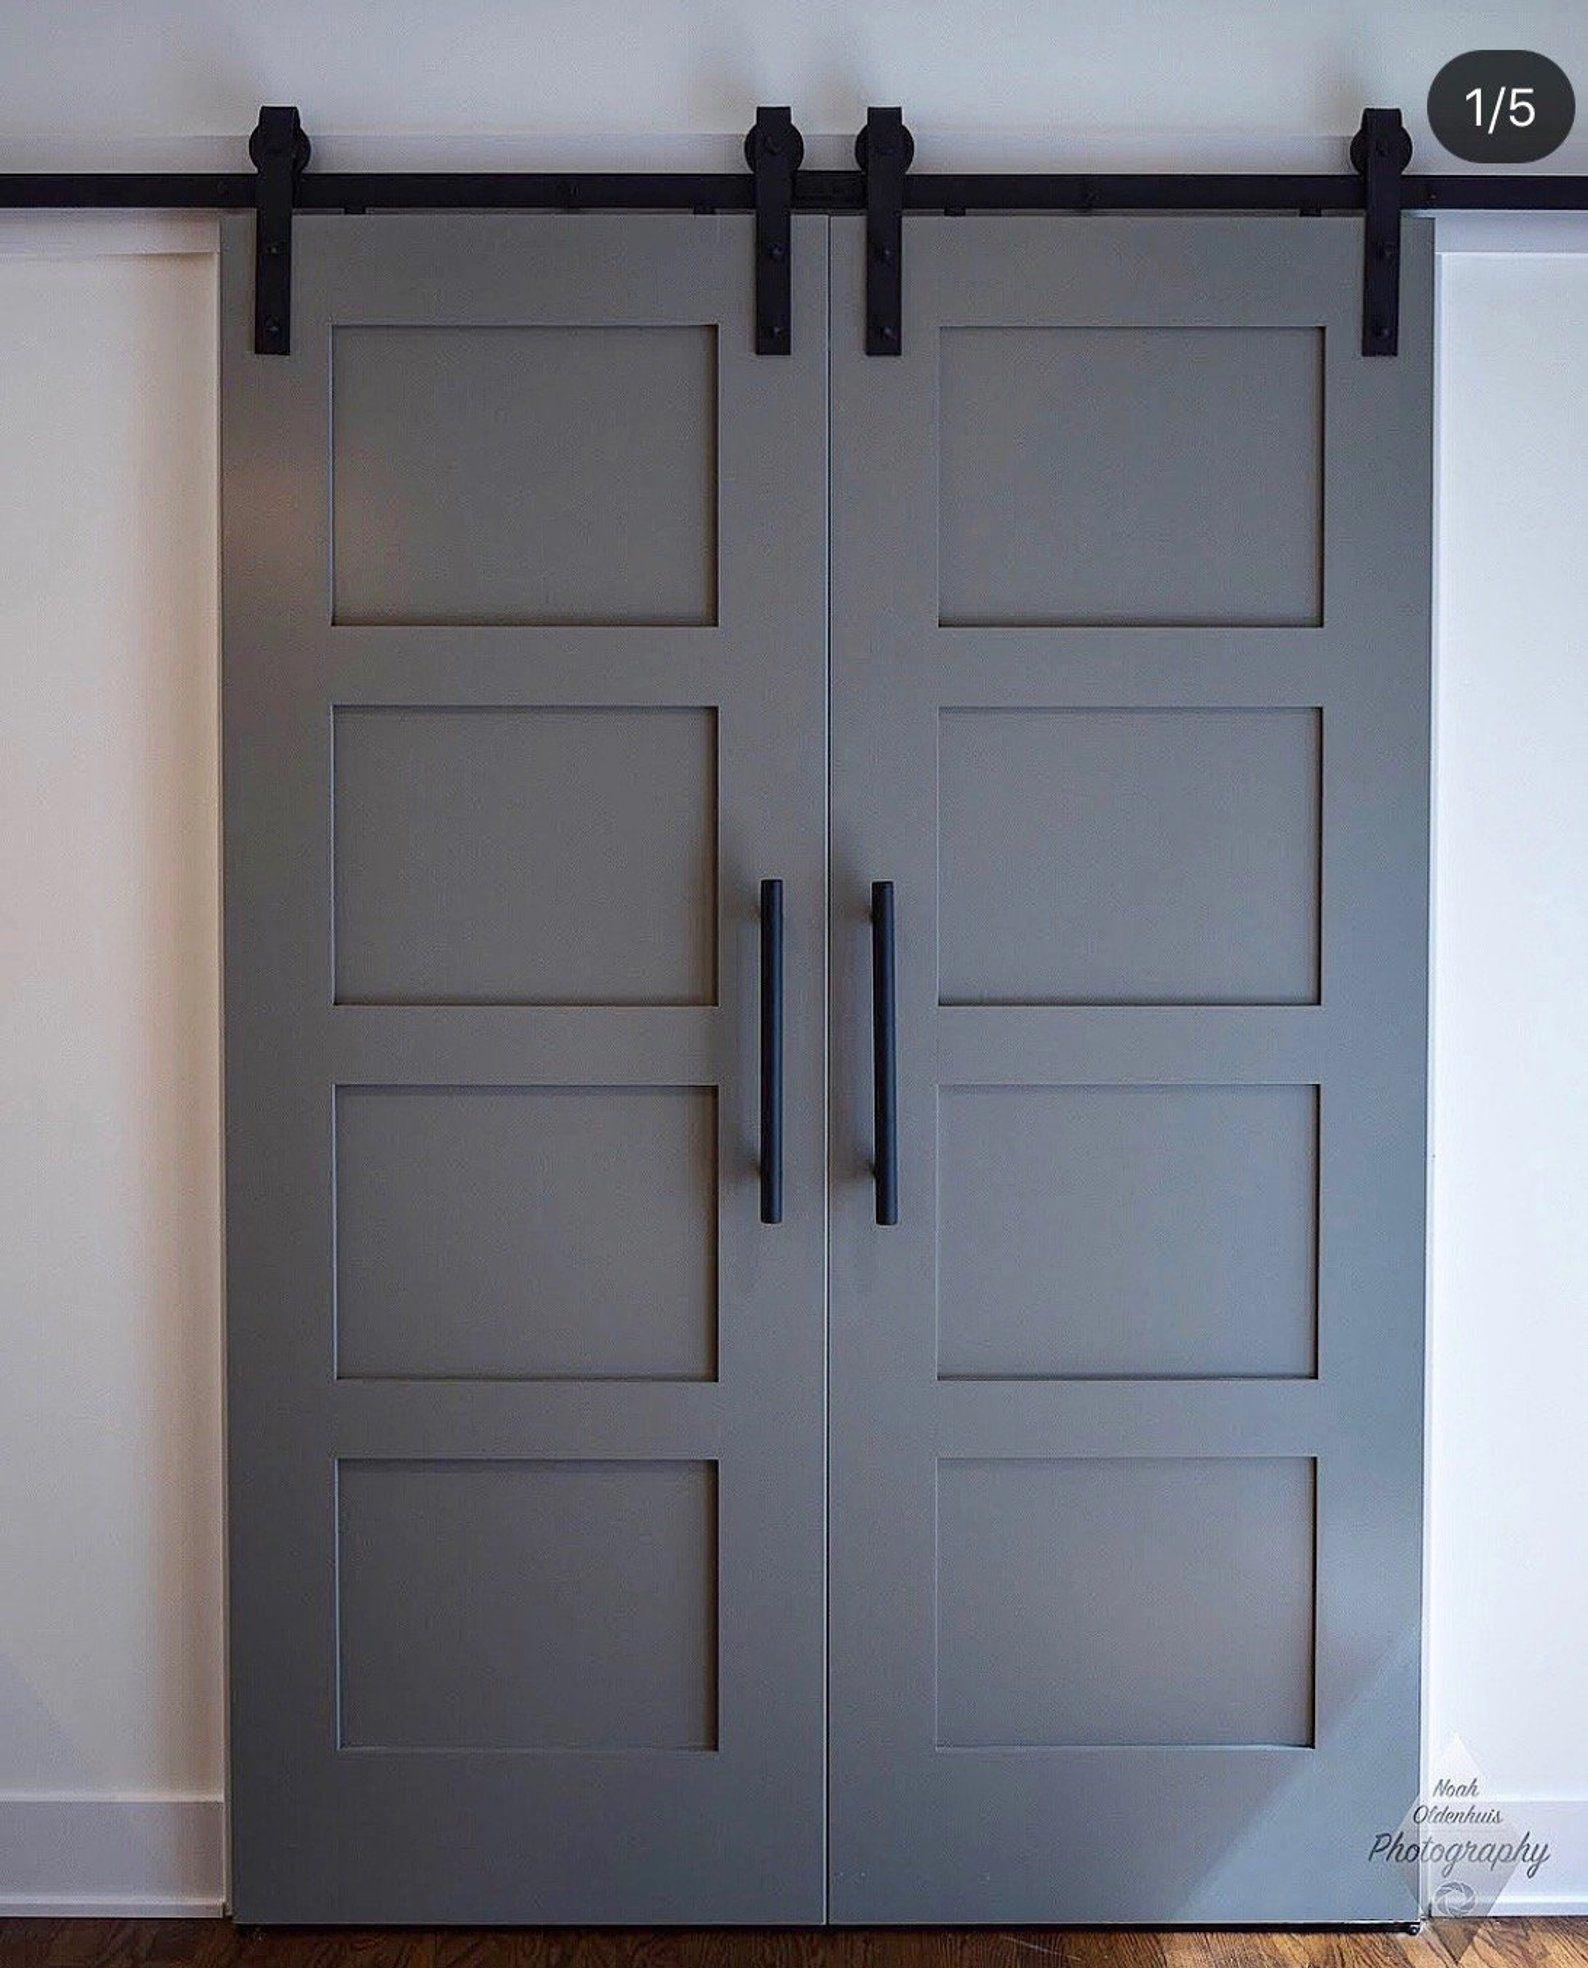 Interior Sliding Closet Doors Internal Folding Glass Doors White Frosted Glass Sliding Closet Doors 20191 Diy Barn Door Barn Door Closet Barn Doors Sliding